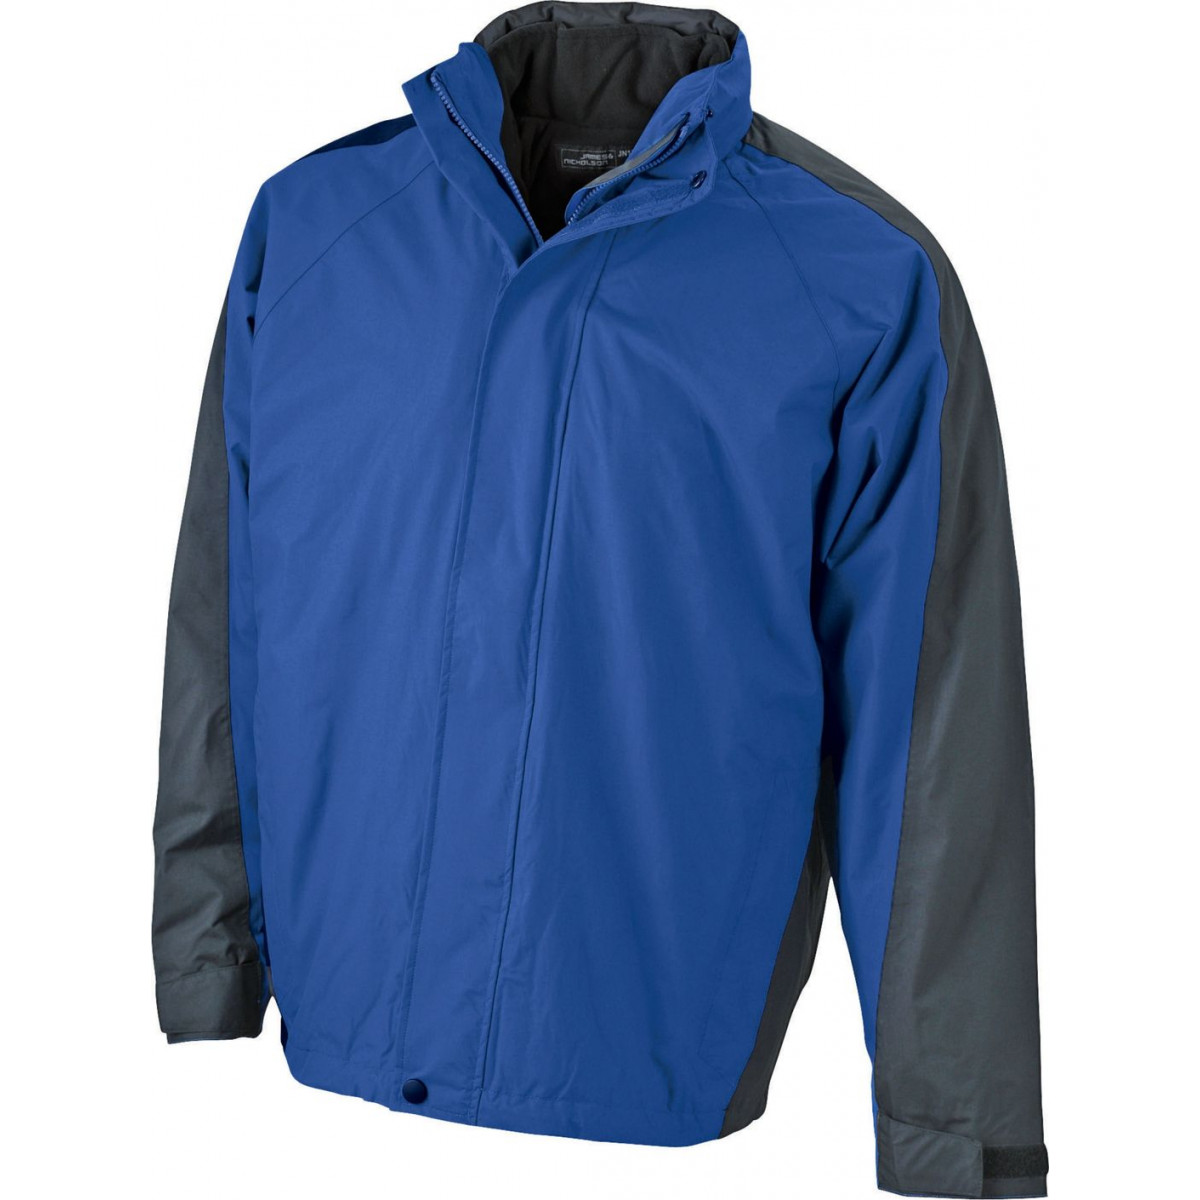 Куртка мужская JN170 Two-In-One Jacket - Ярко-синий/Черный